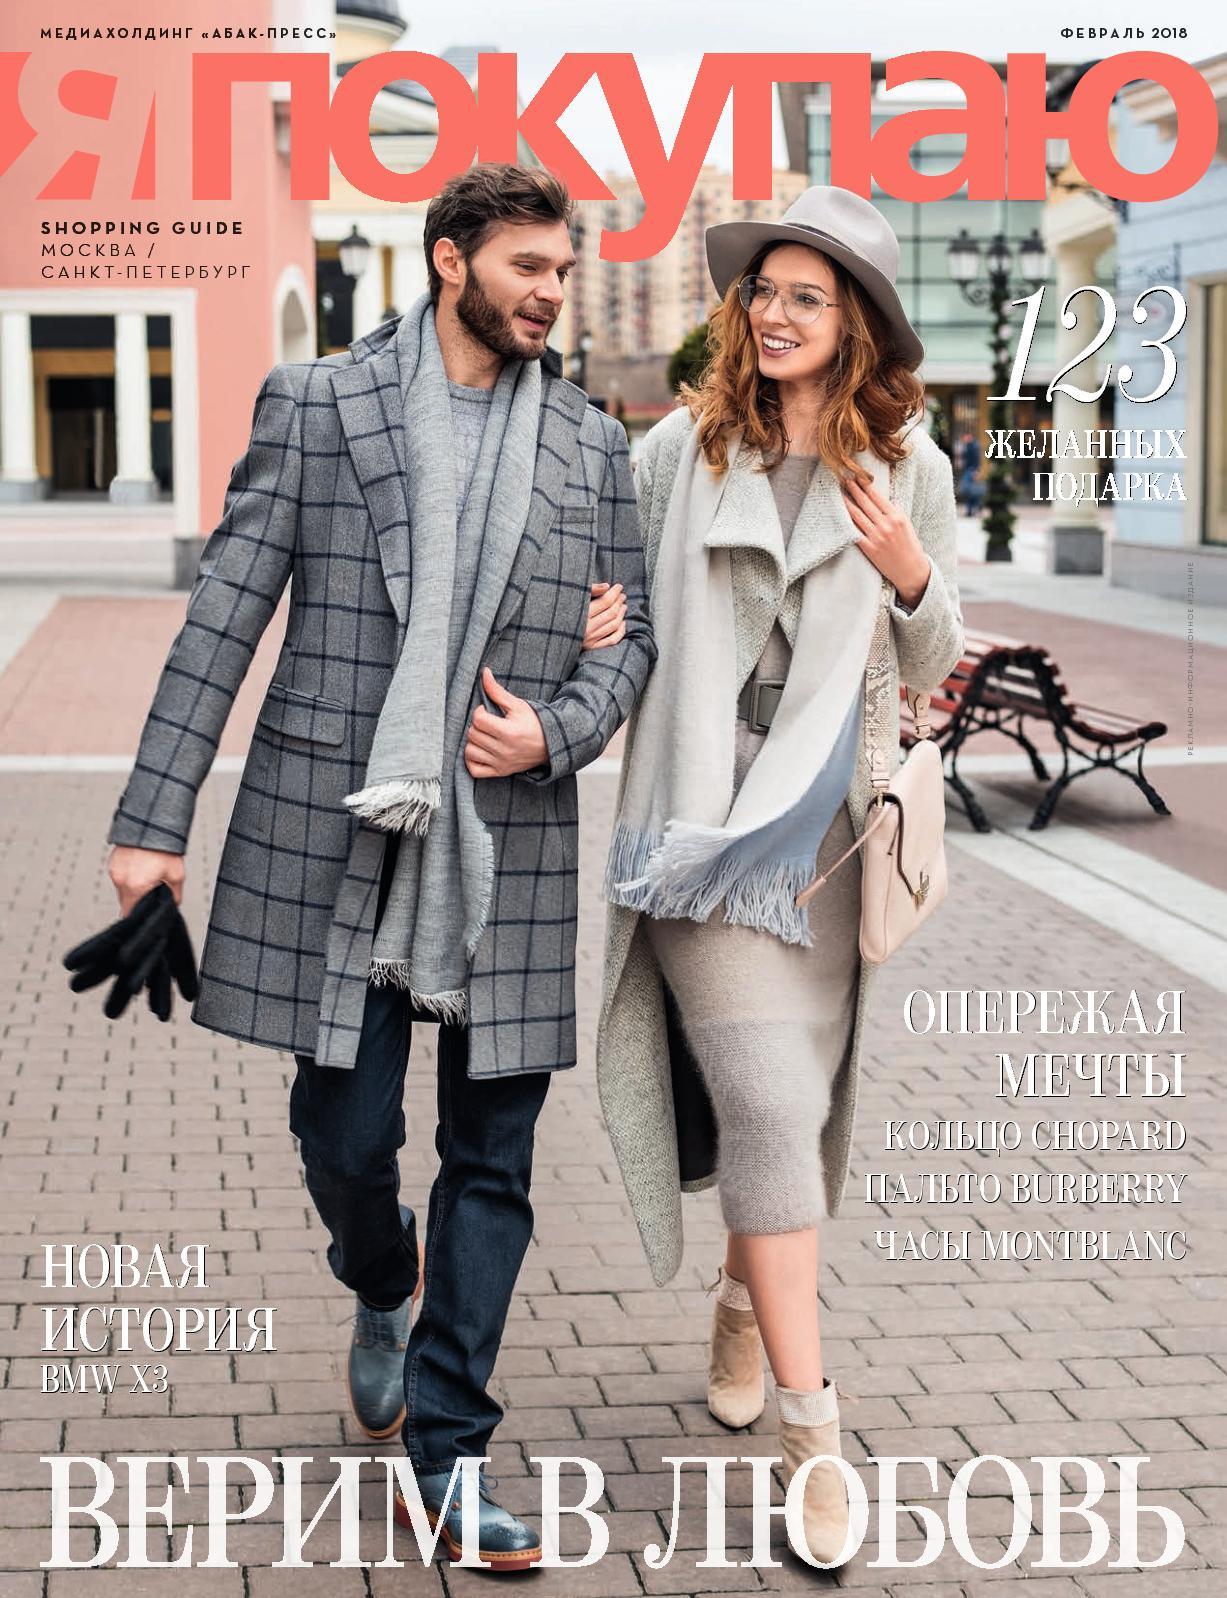 6b9fa9c1419fad9 Calaméo - Shopping Guide «Я Покупаю. Москва - Санкт-Петербург», февраль 2018